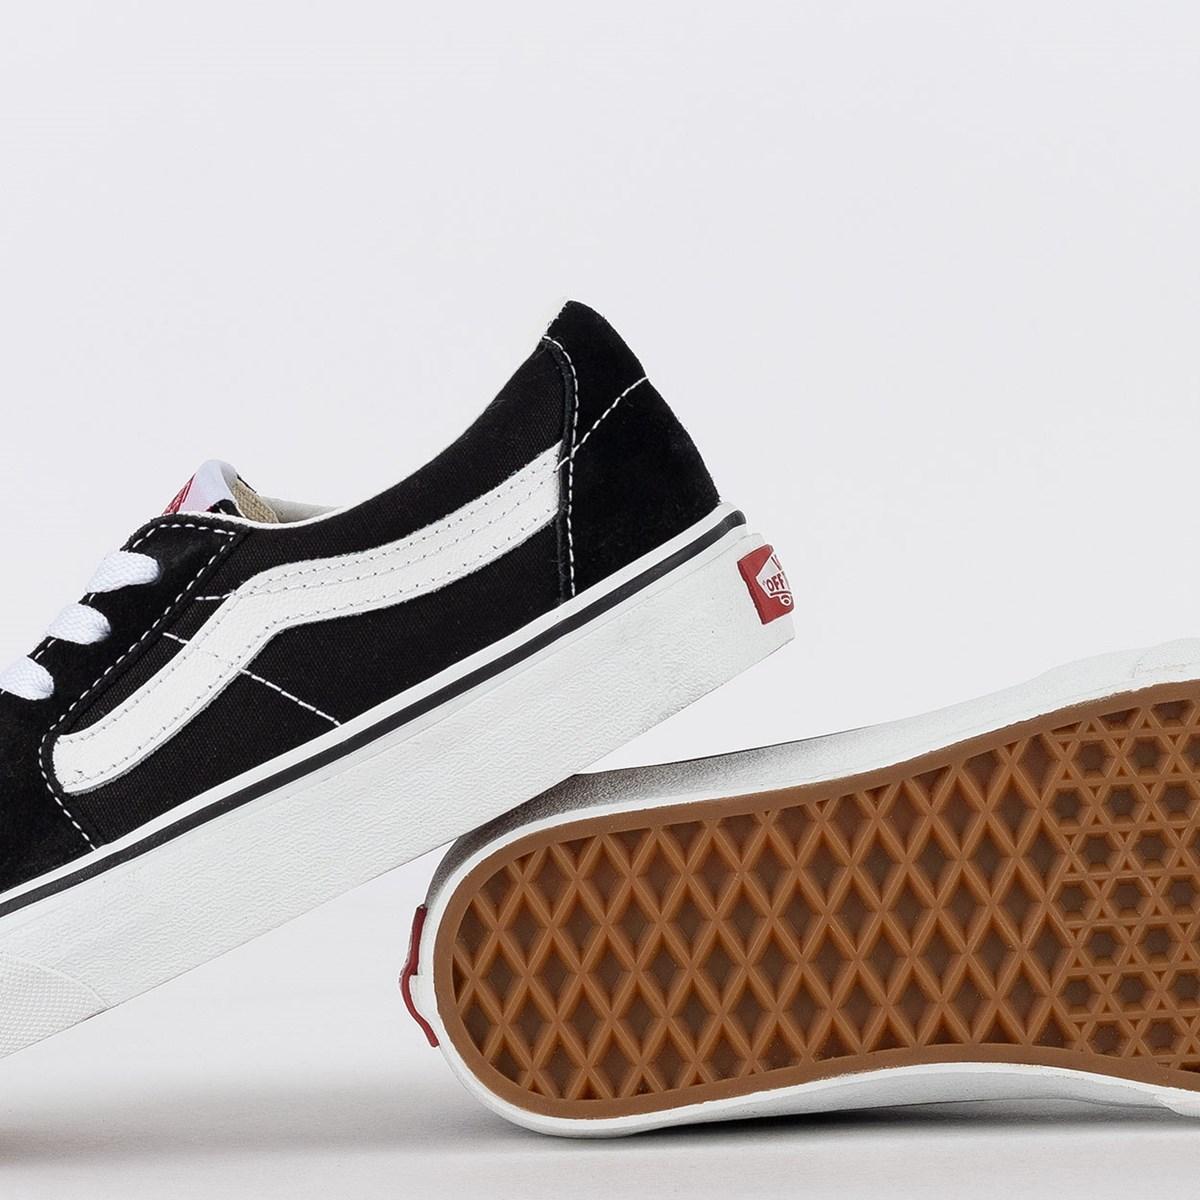 Tênis Vans Sk8 Low Black True White VN0A4UUK6BT